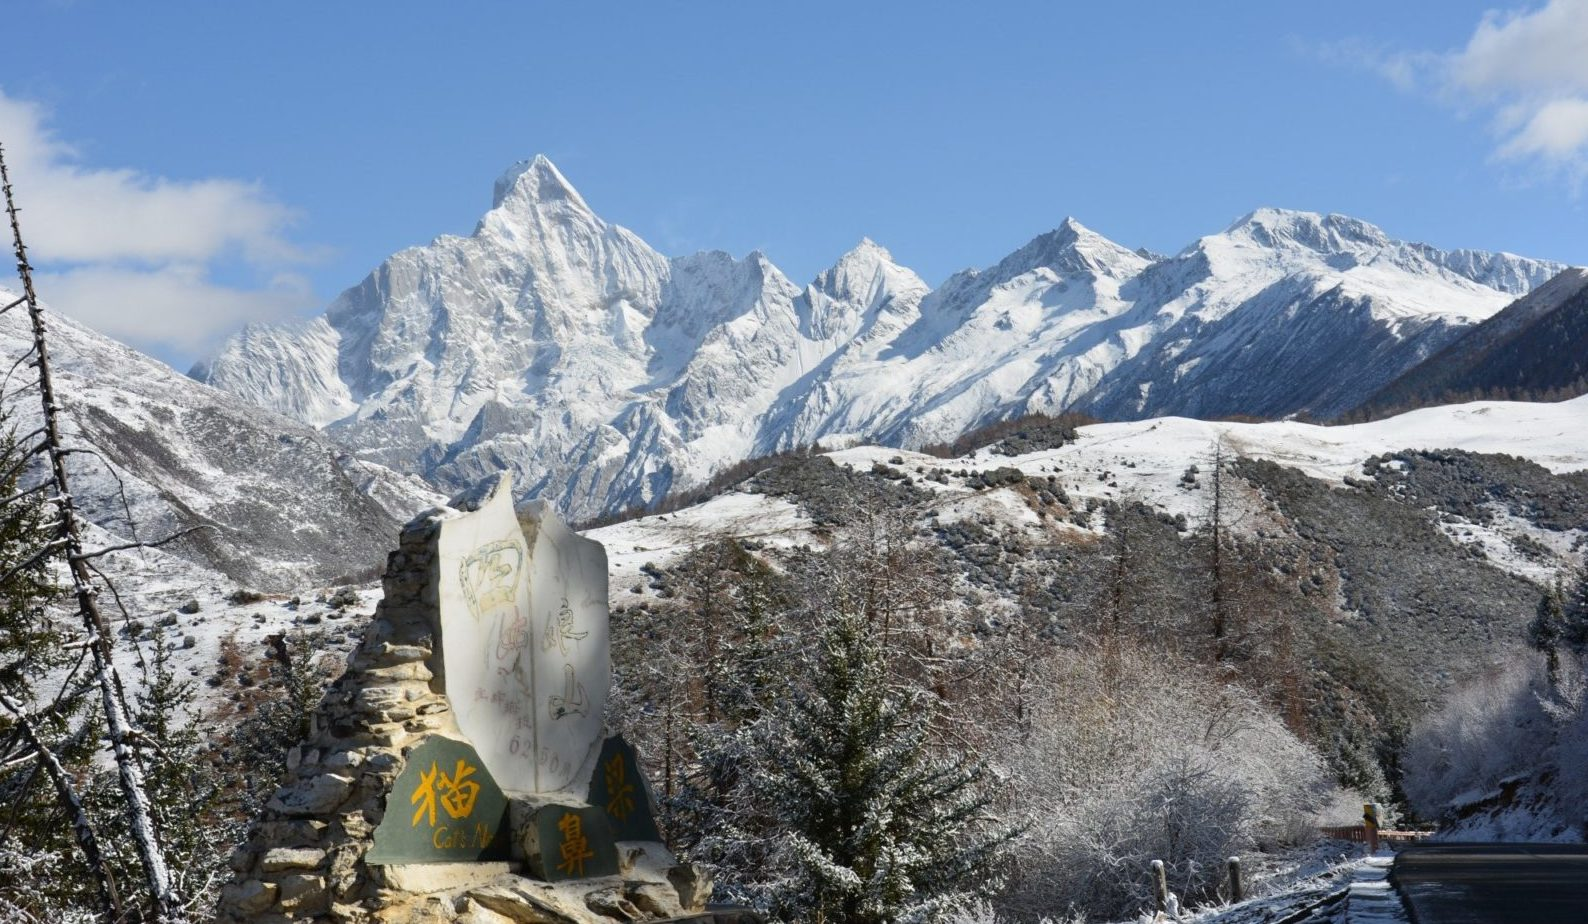 Mt. Siguniang, 四姑娘山 (6,250m)